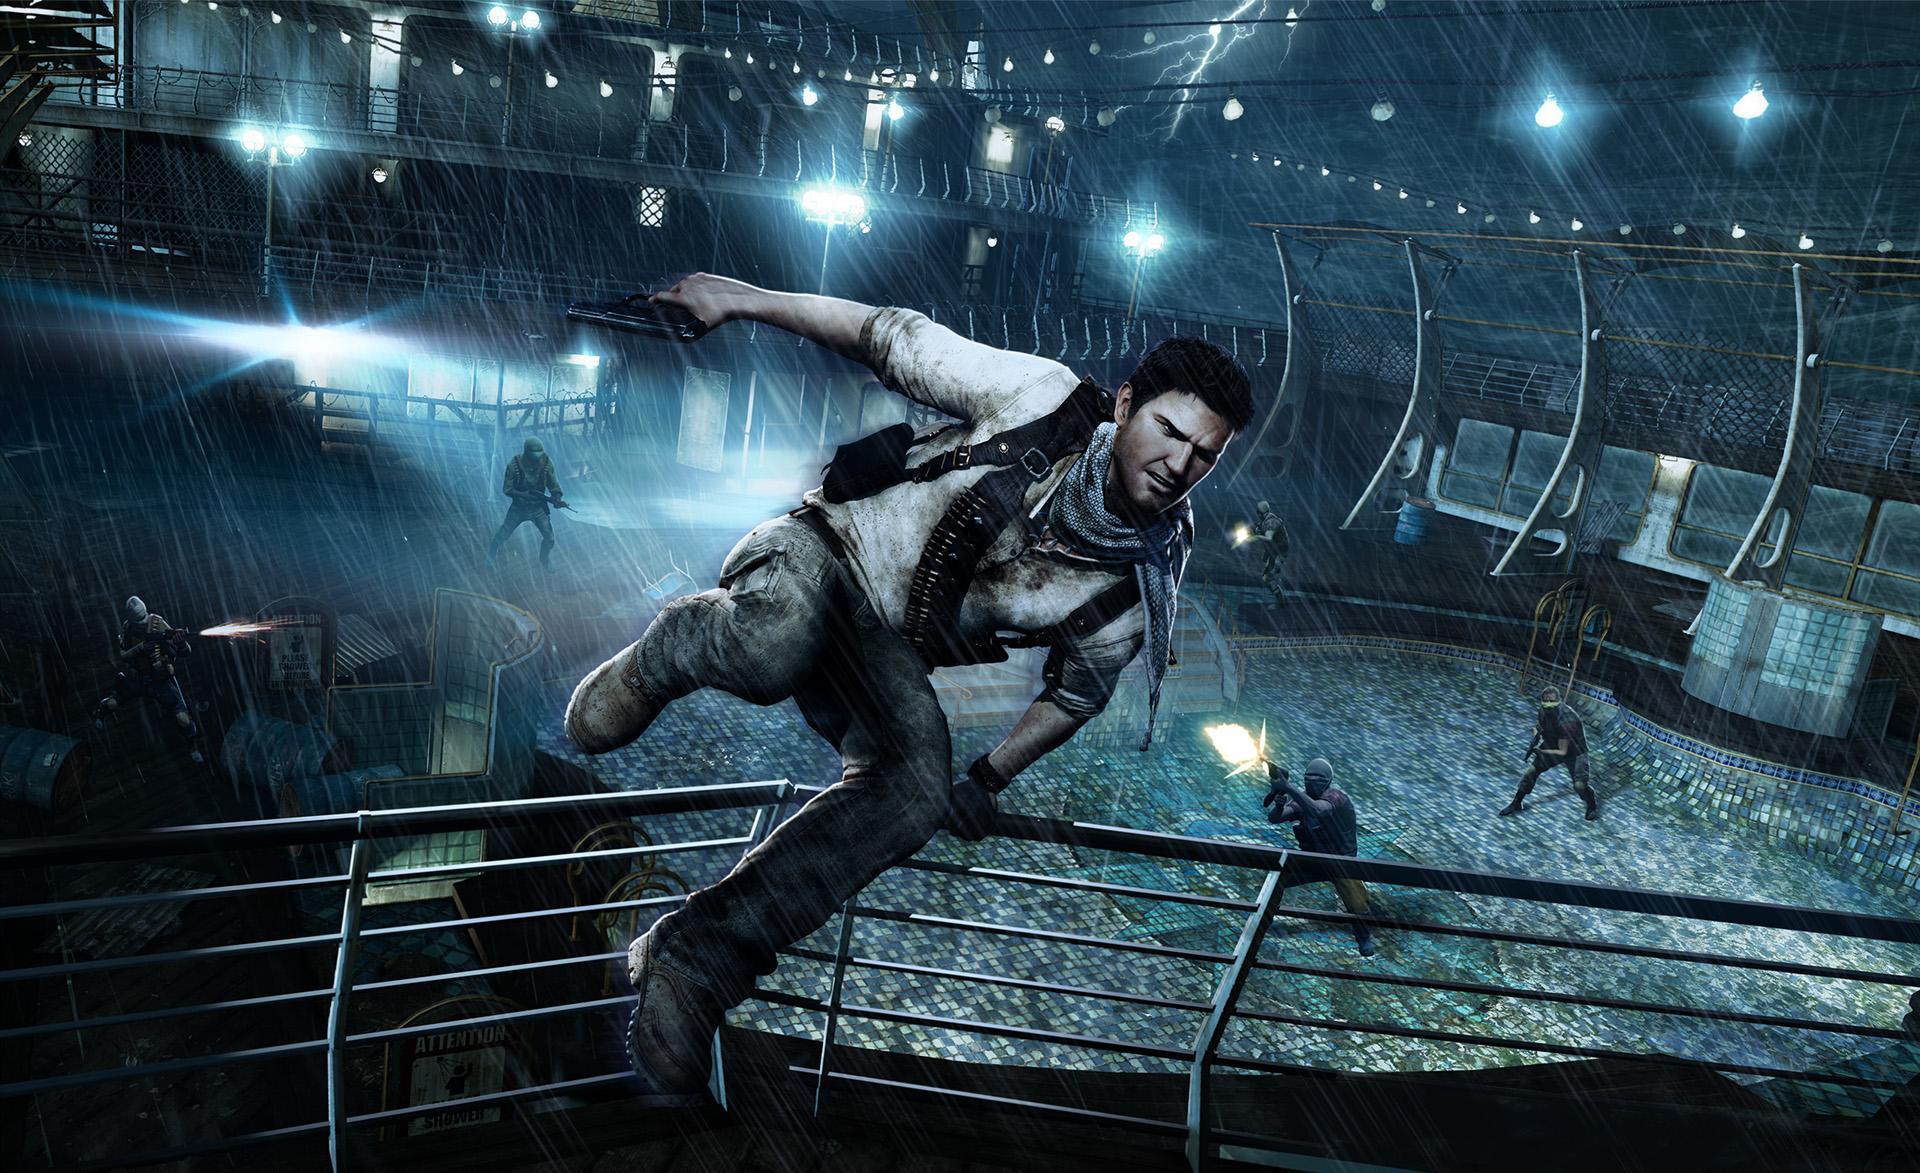 Арт к игре Uncharted 3: Drake's Deception